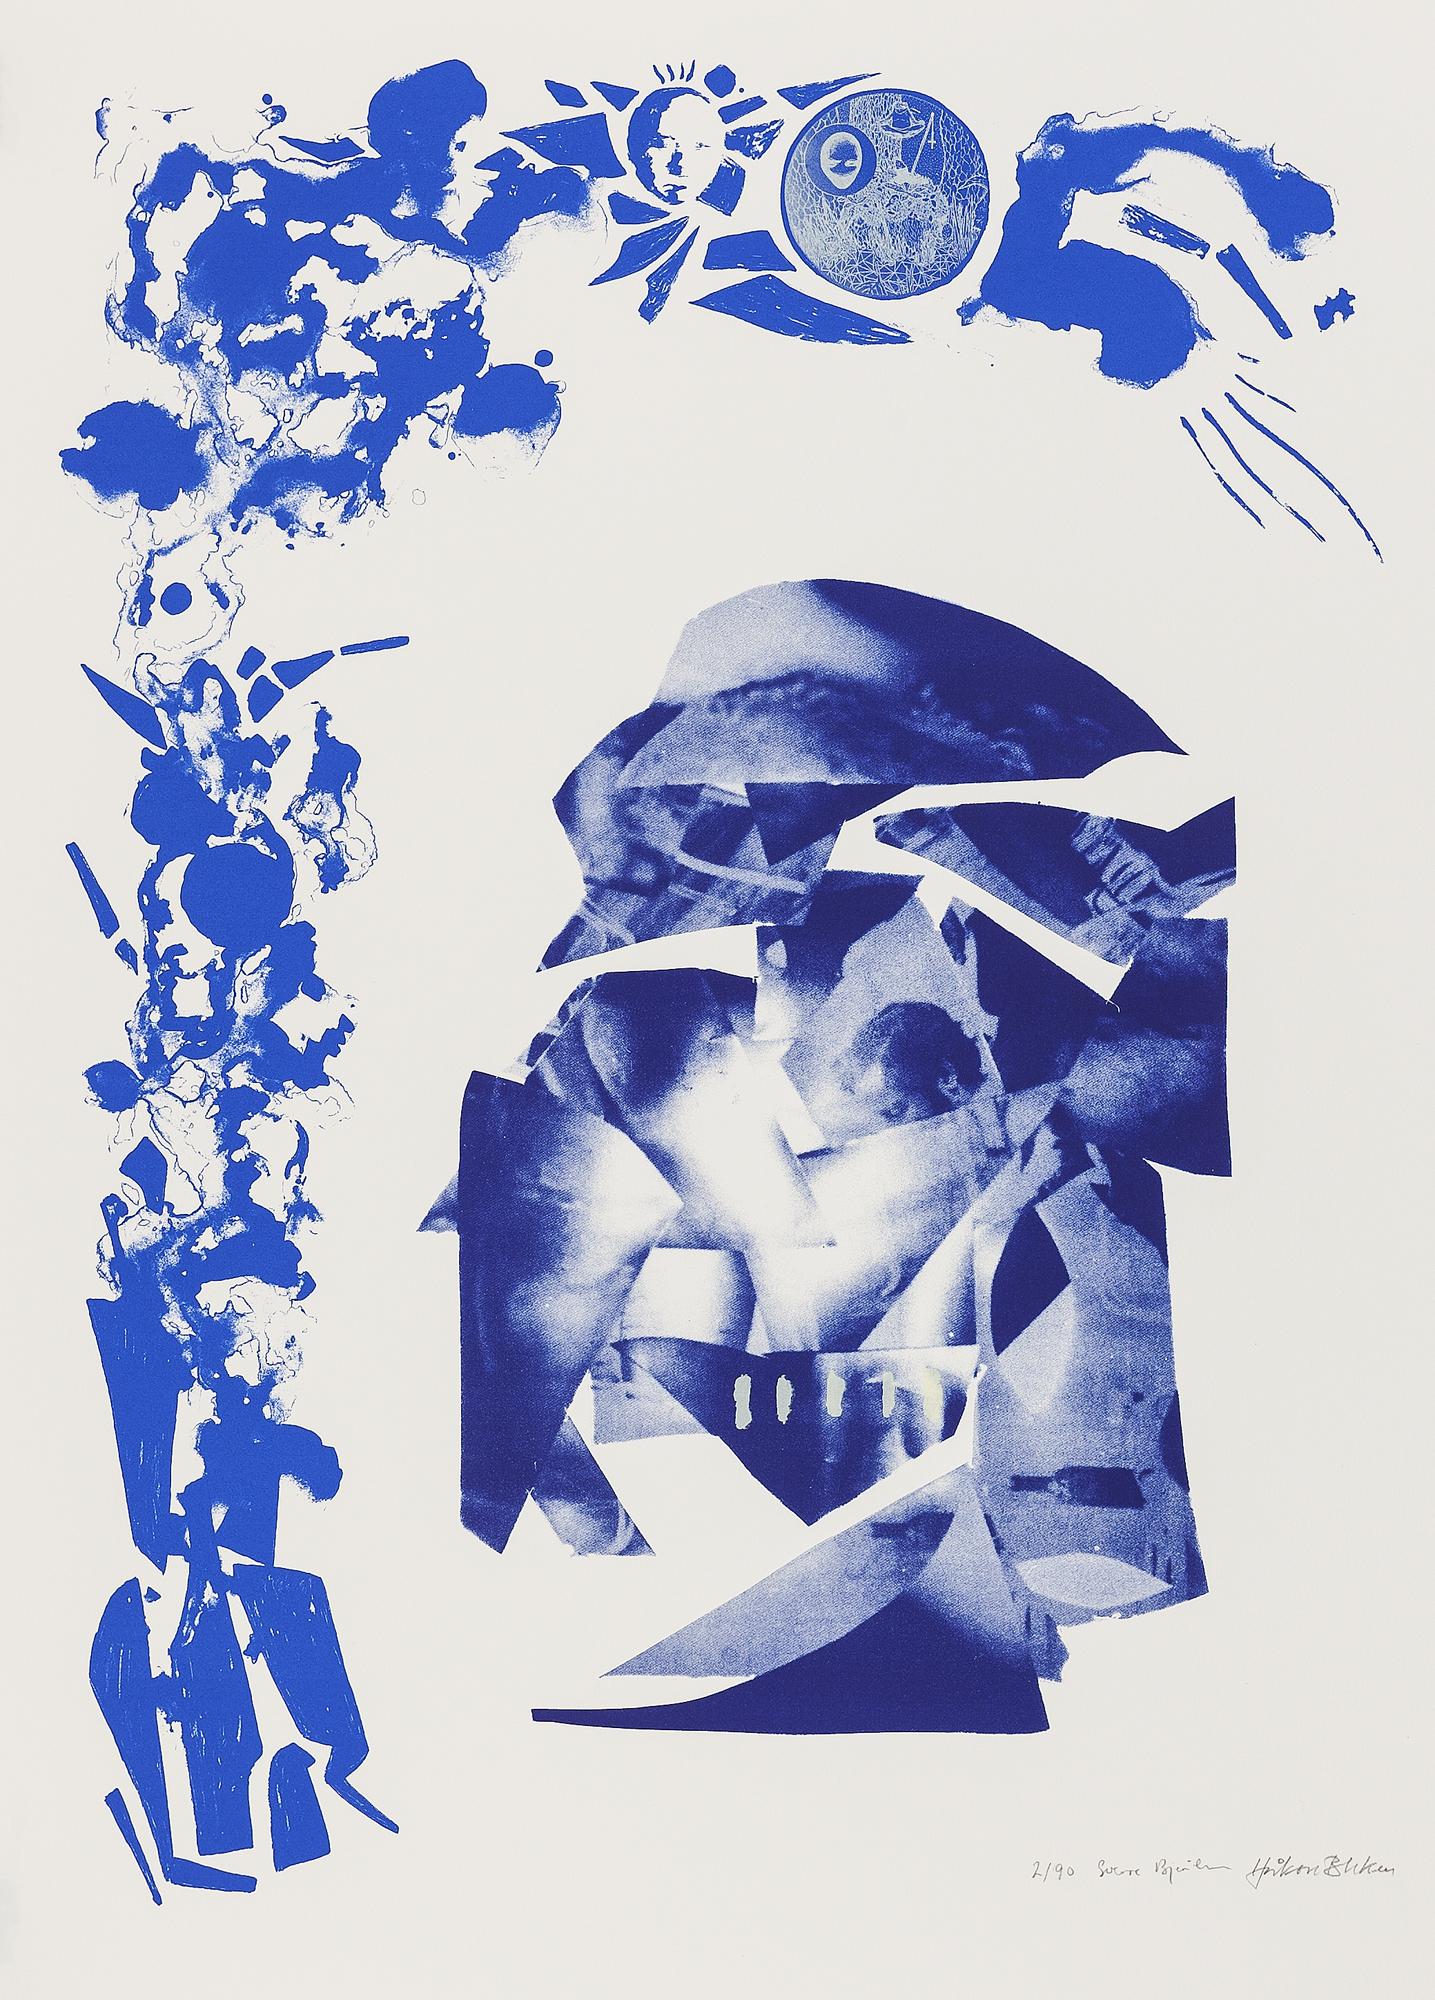 Visual Artwork: Untitled I ( Bjertnes/Bleken ) by artist and creator Sverre Bjertnes/Håkon Bleken